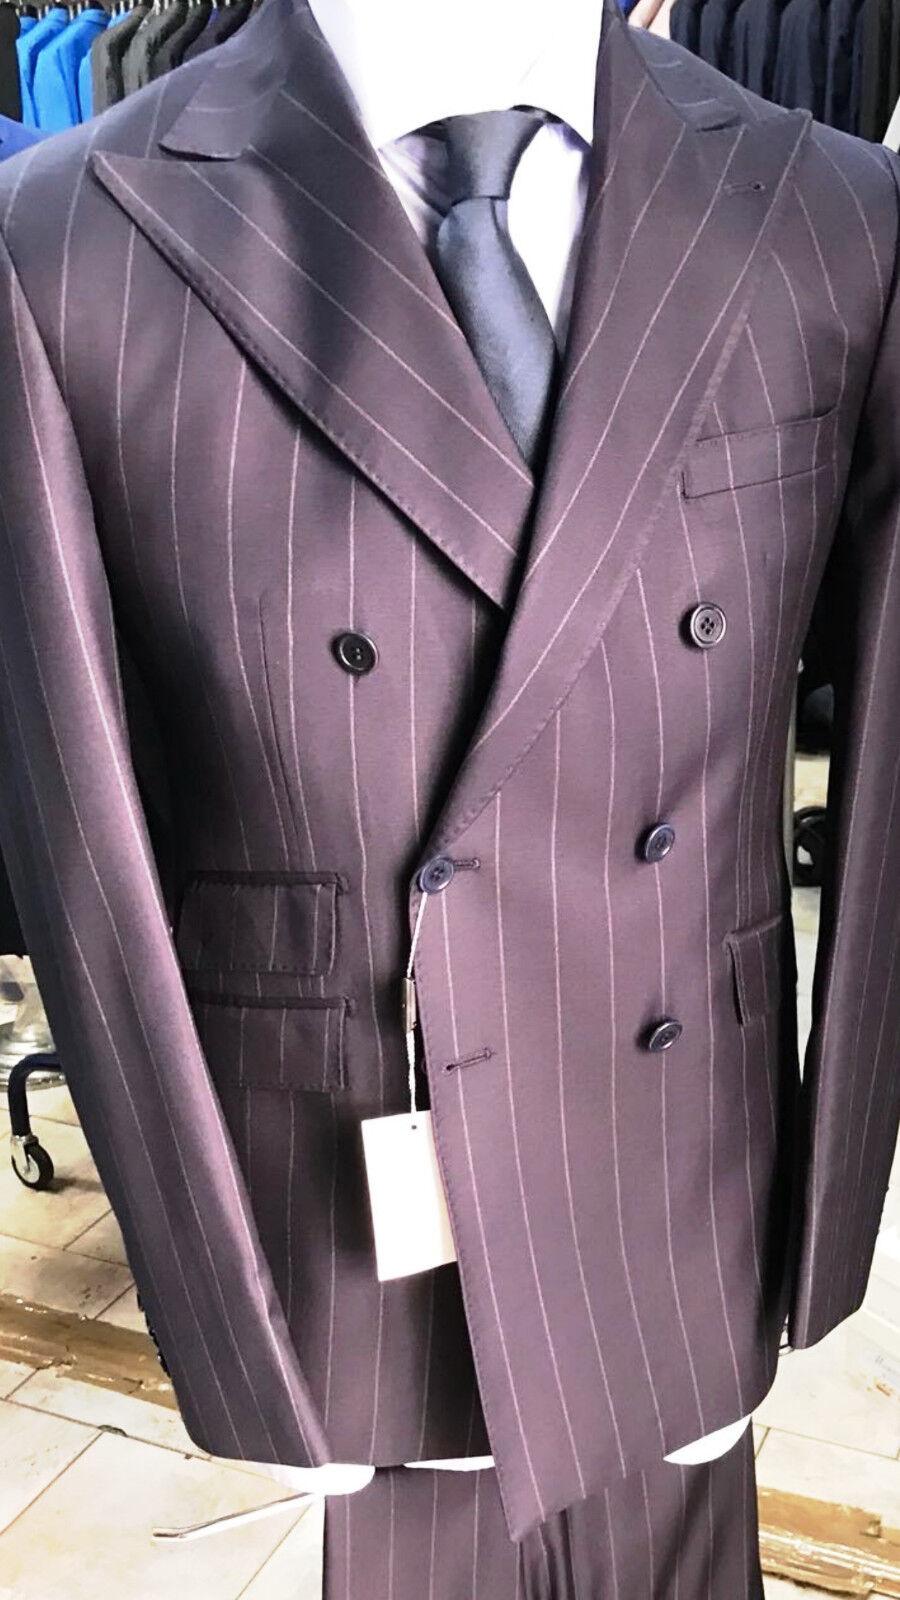 Blau pinstripe super 150 Cerruti wool suit/ 5 inch wide peak lapel